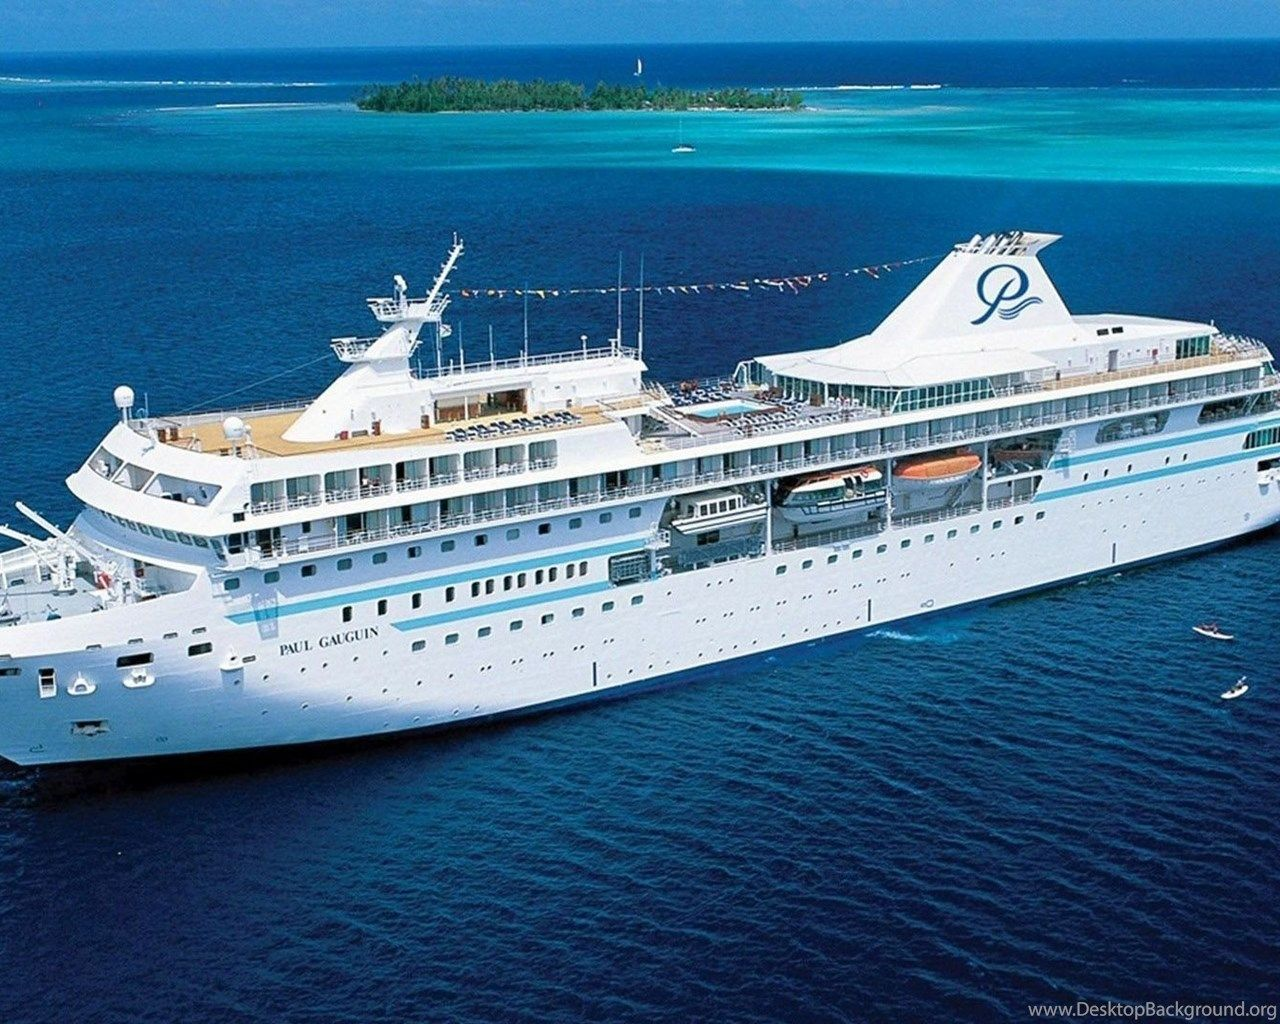 4k Ultra Hd Cruise Ship Wallpapers Top Free 4k Ultra Hd Cruise Ship Backgrounds Wallpaperaccess